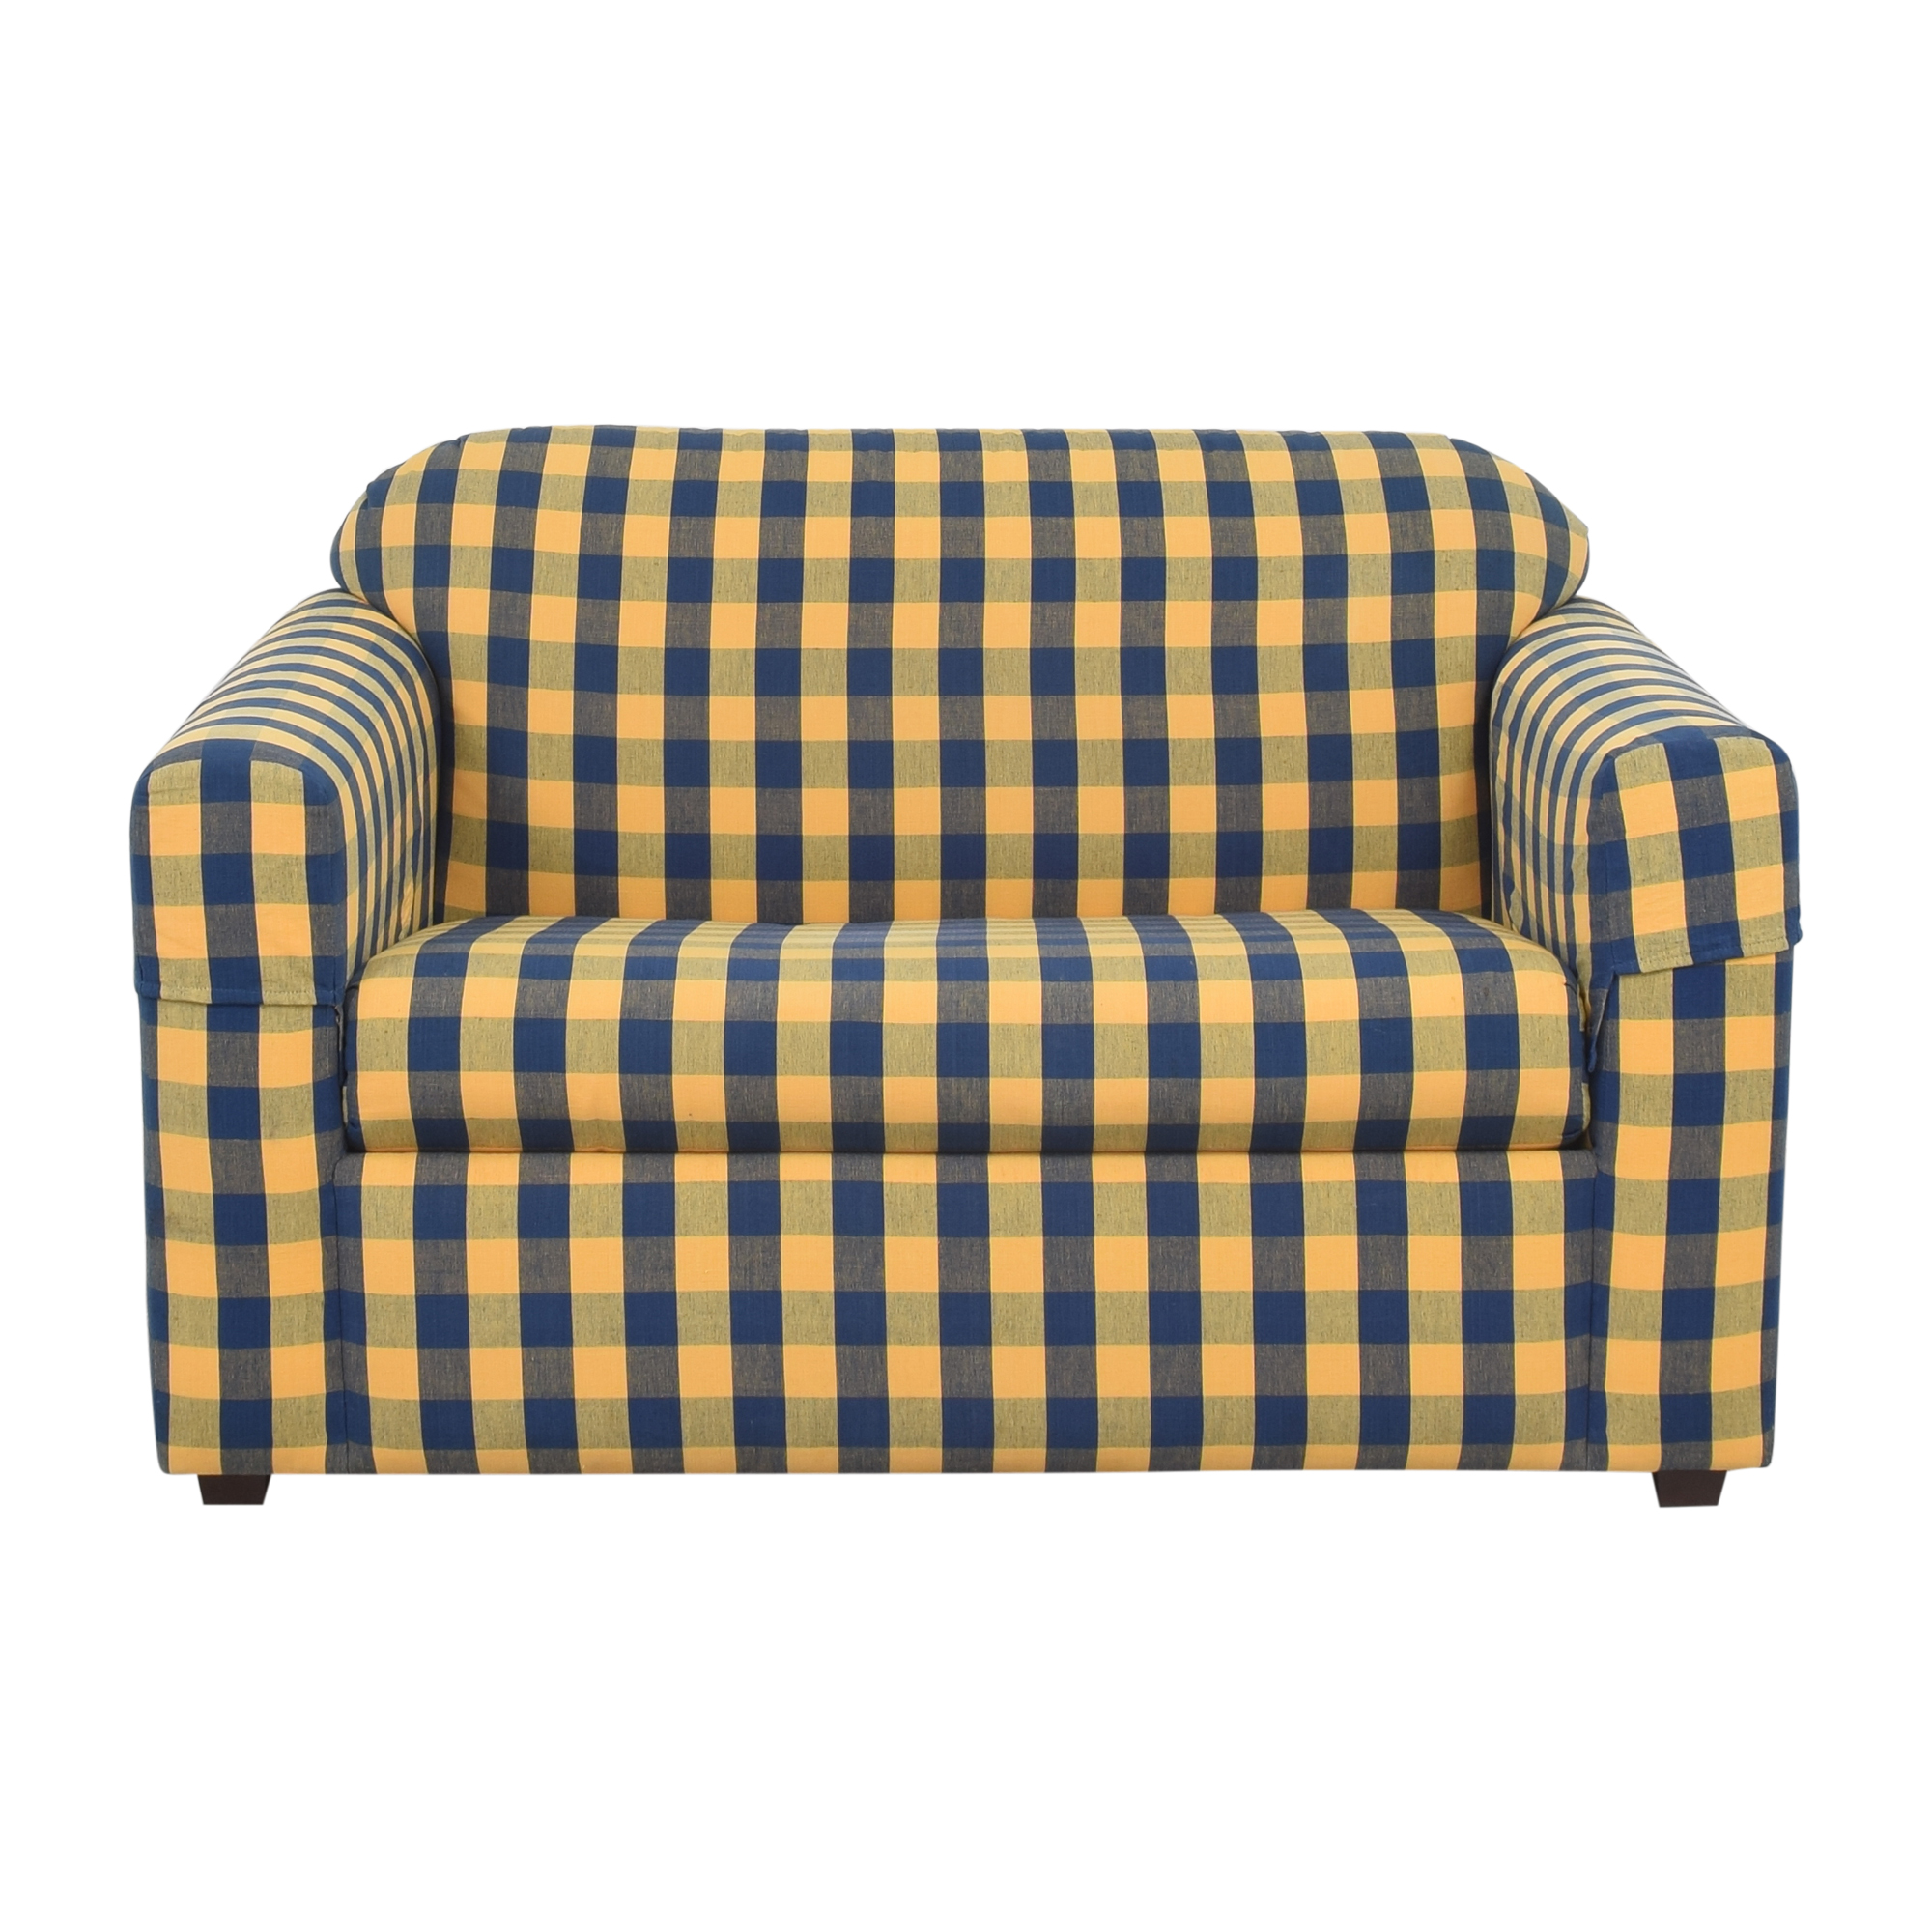 shop Flexsteel Flexsteel Sleephaven Twin Sleeper Sofa online